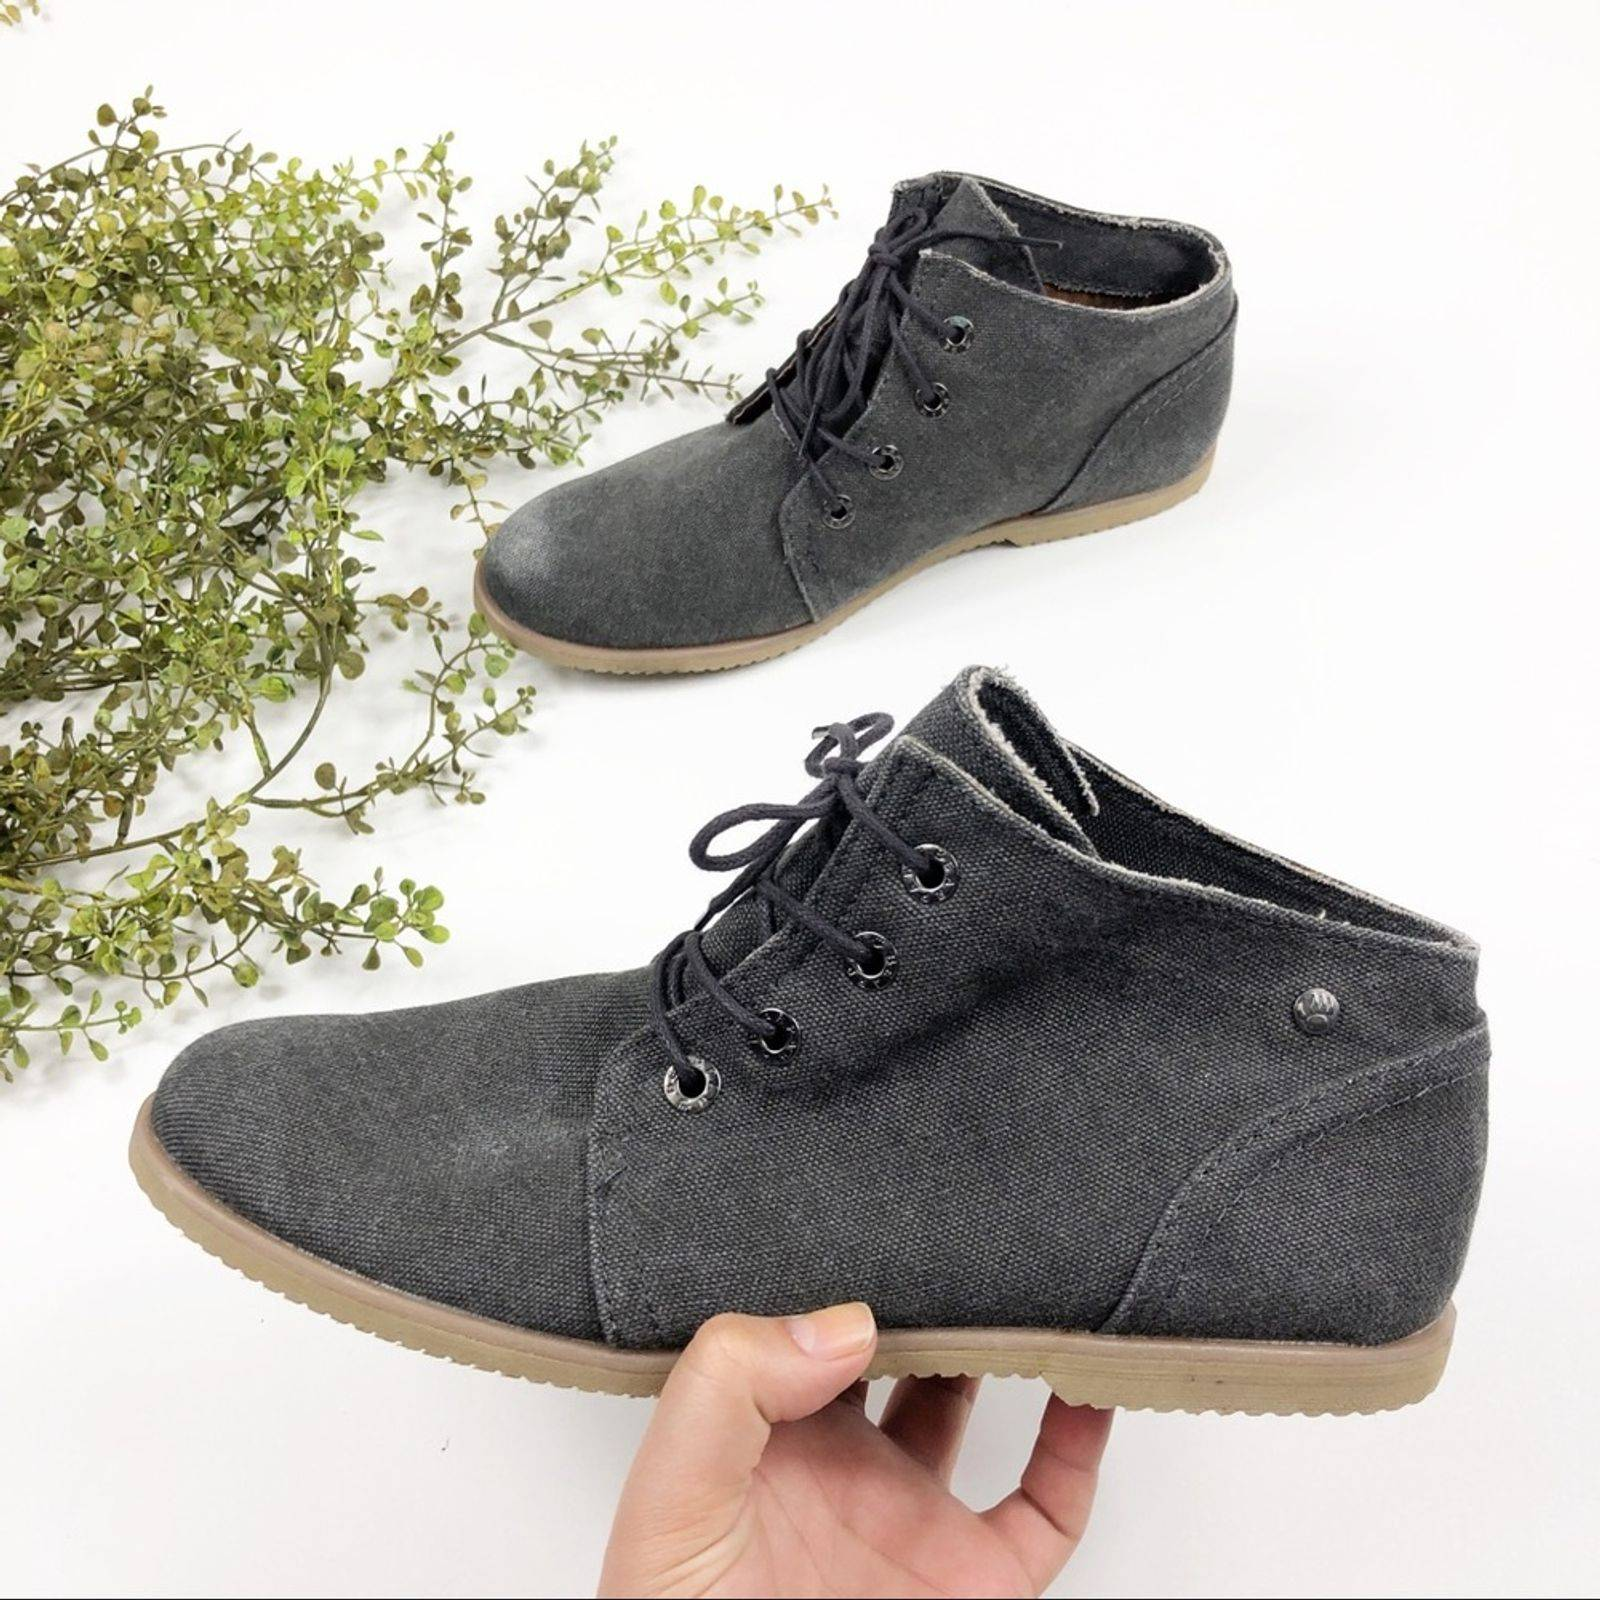 BEARPAW Chukka Boots | Mercari